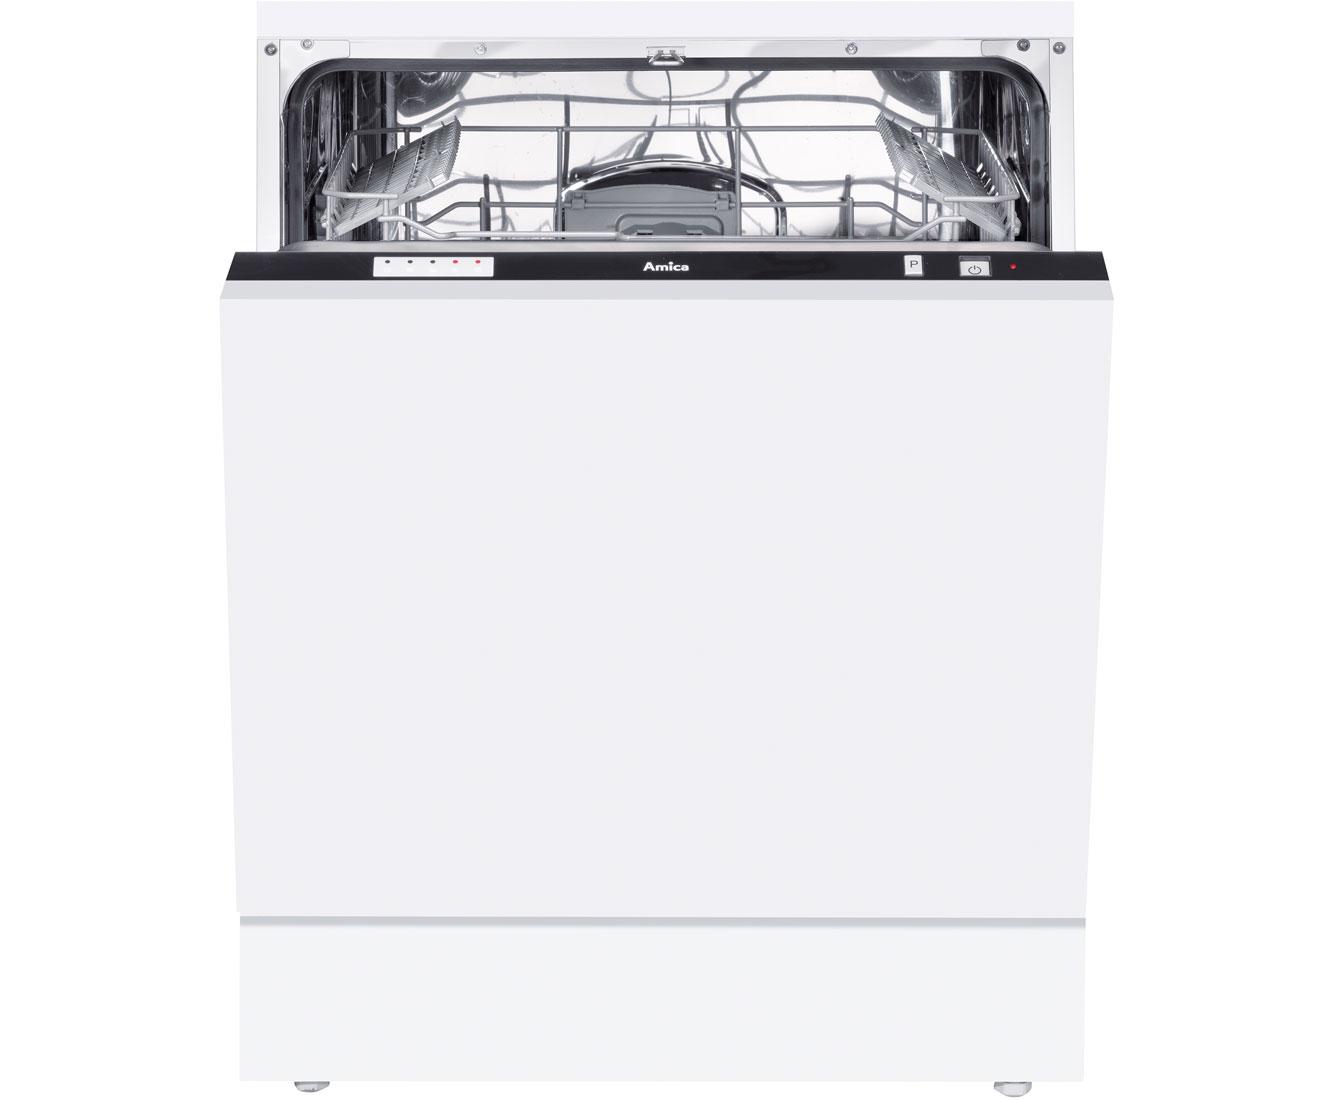 Vollintegrierter Geschirrspuler 45 Cm Neff Gkv4508m Edelstahl